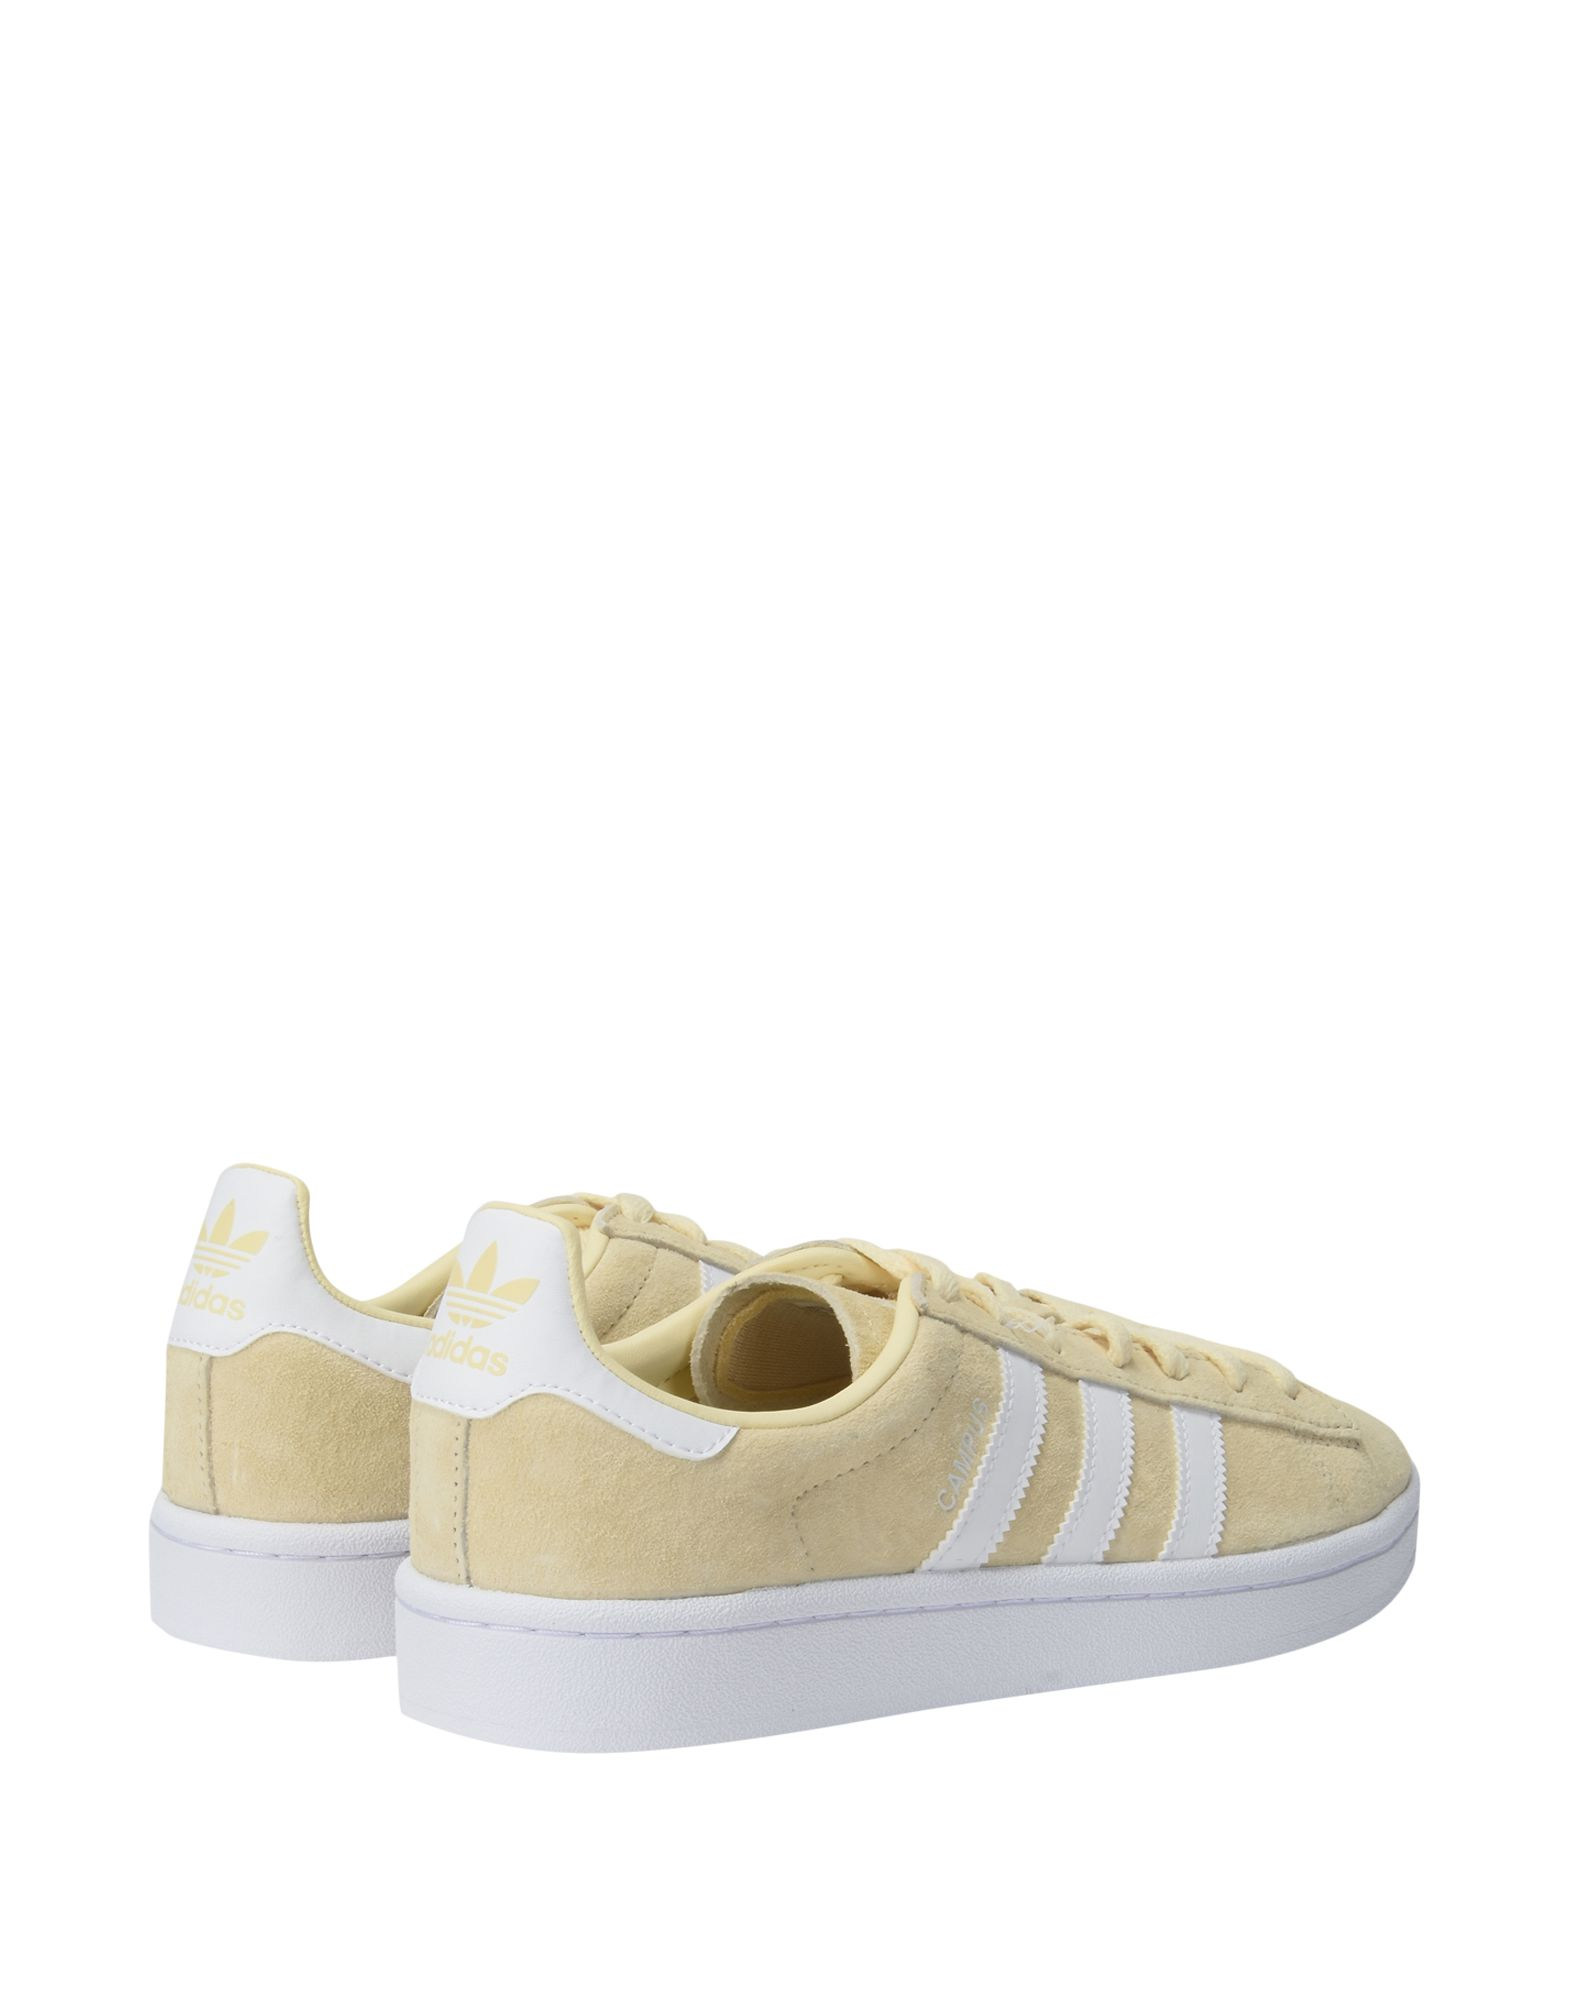 Adidas Originals Adidas Campus  11421615PD Gute beliebte Qualität beliebte Gute Schuhe 976e67